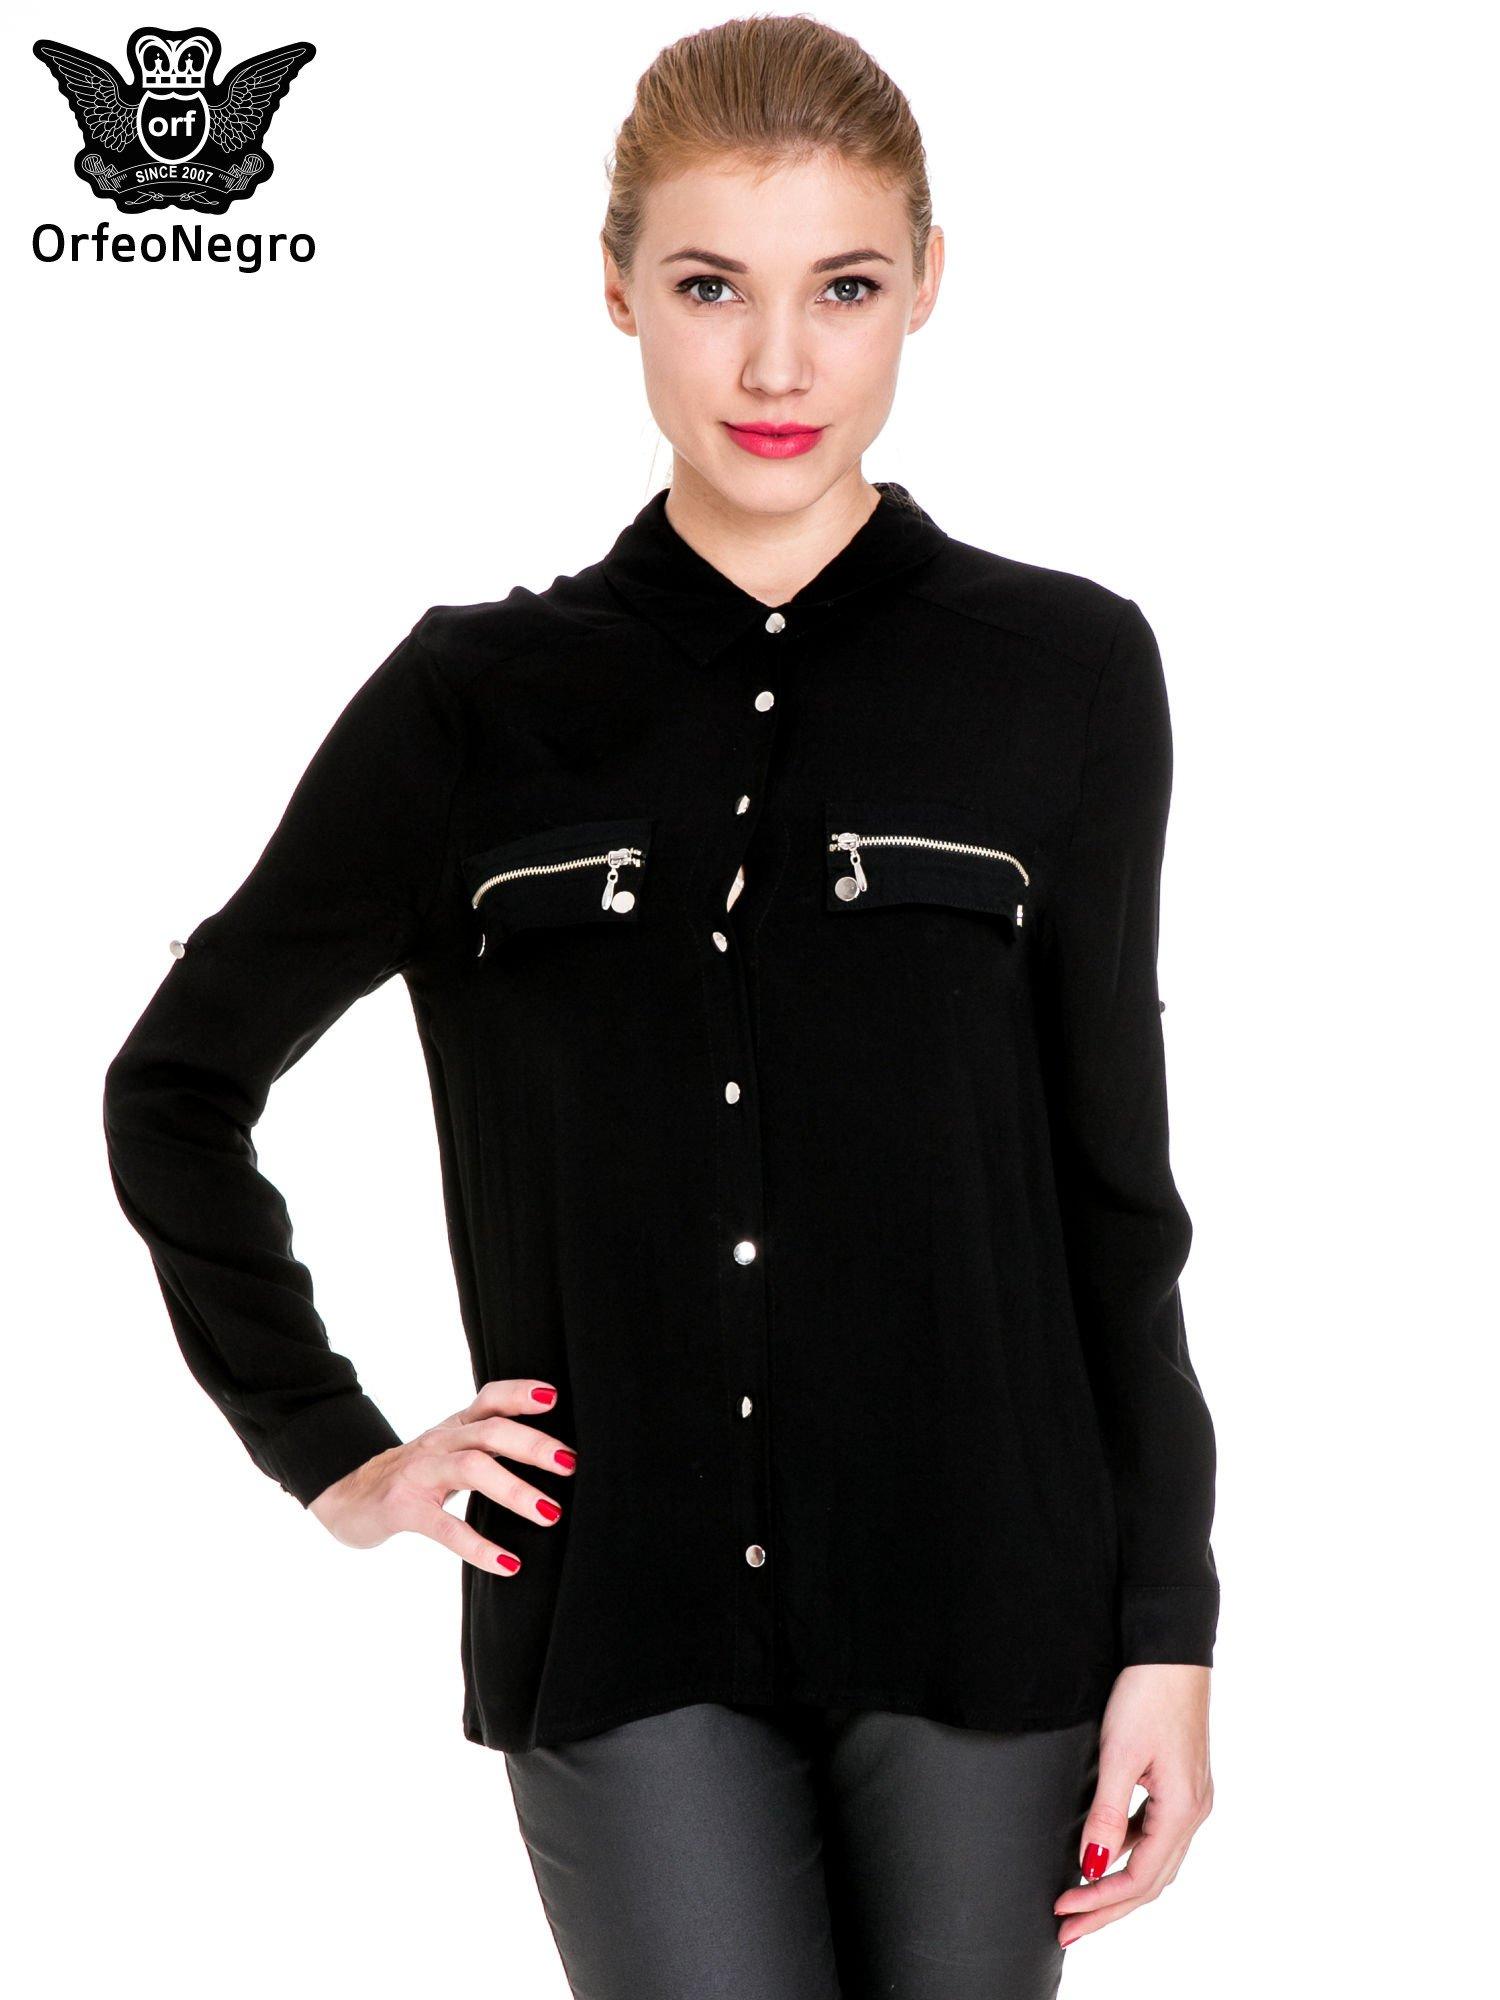 Czarna elegancka koszula z suwakami i napami                                  zdj.                                  1